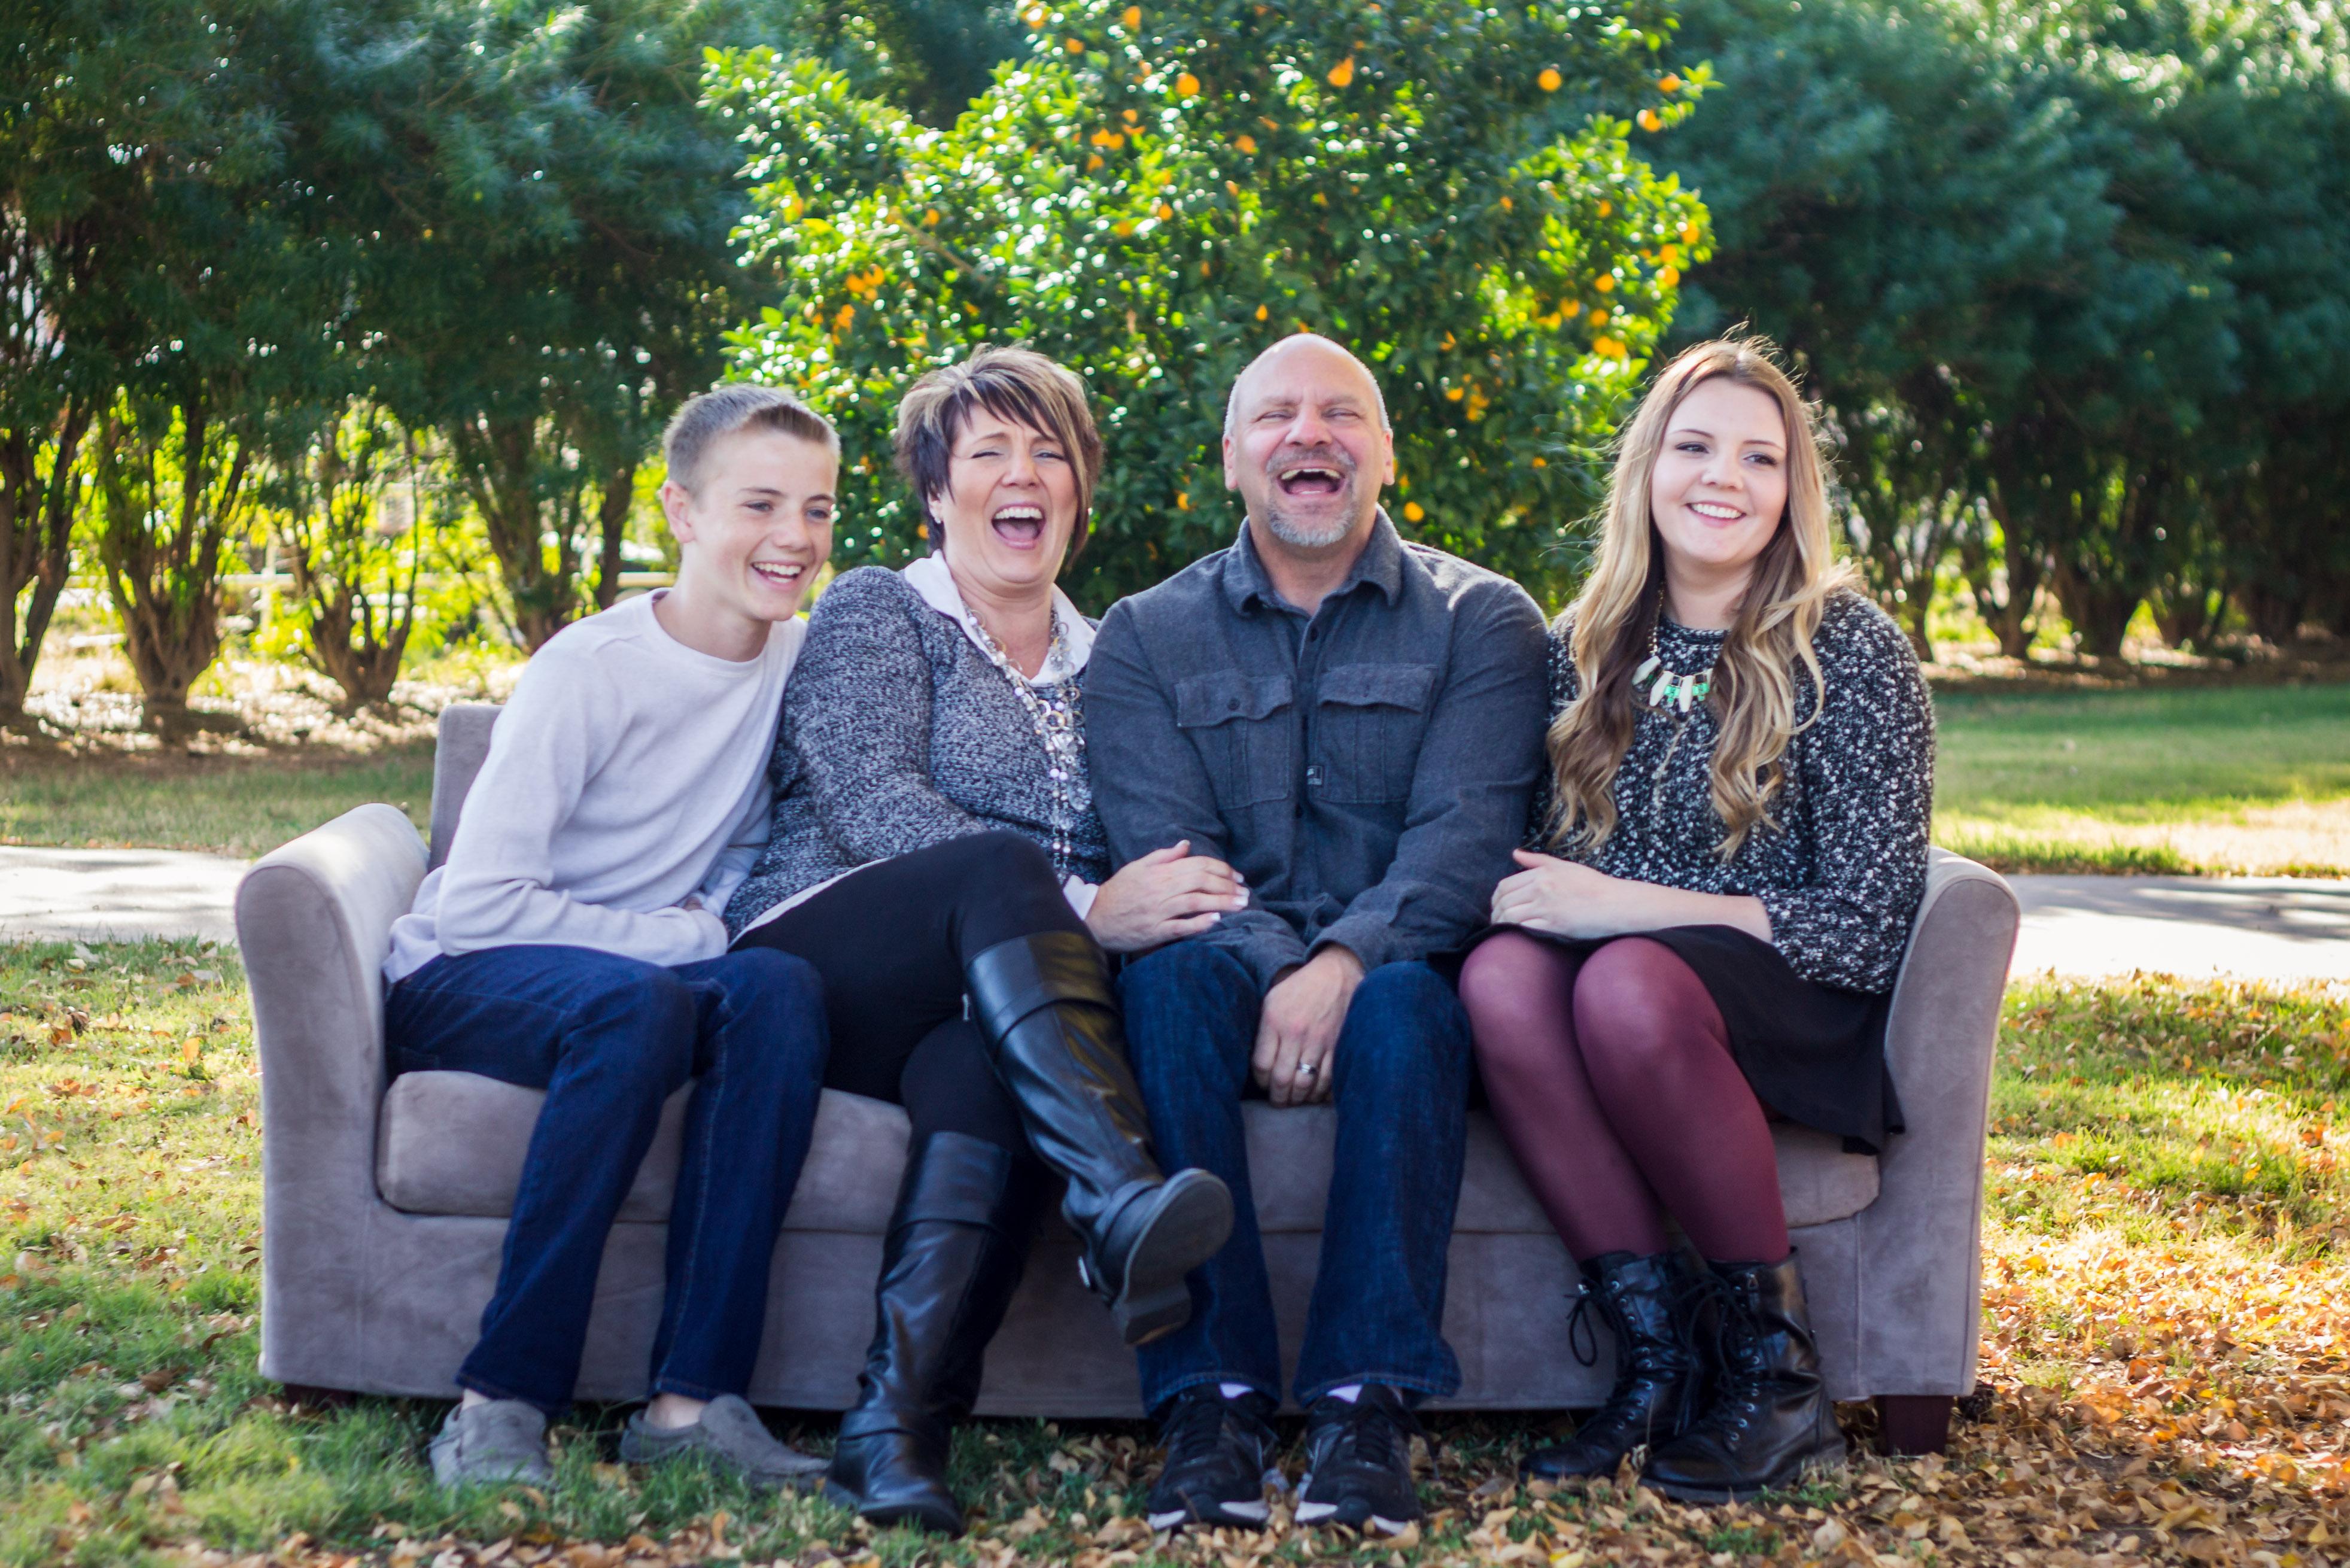 Laughing Family {Alysa Bajenaru Photography}